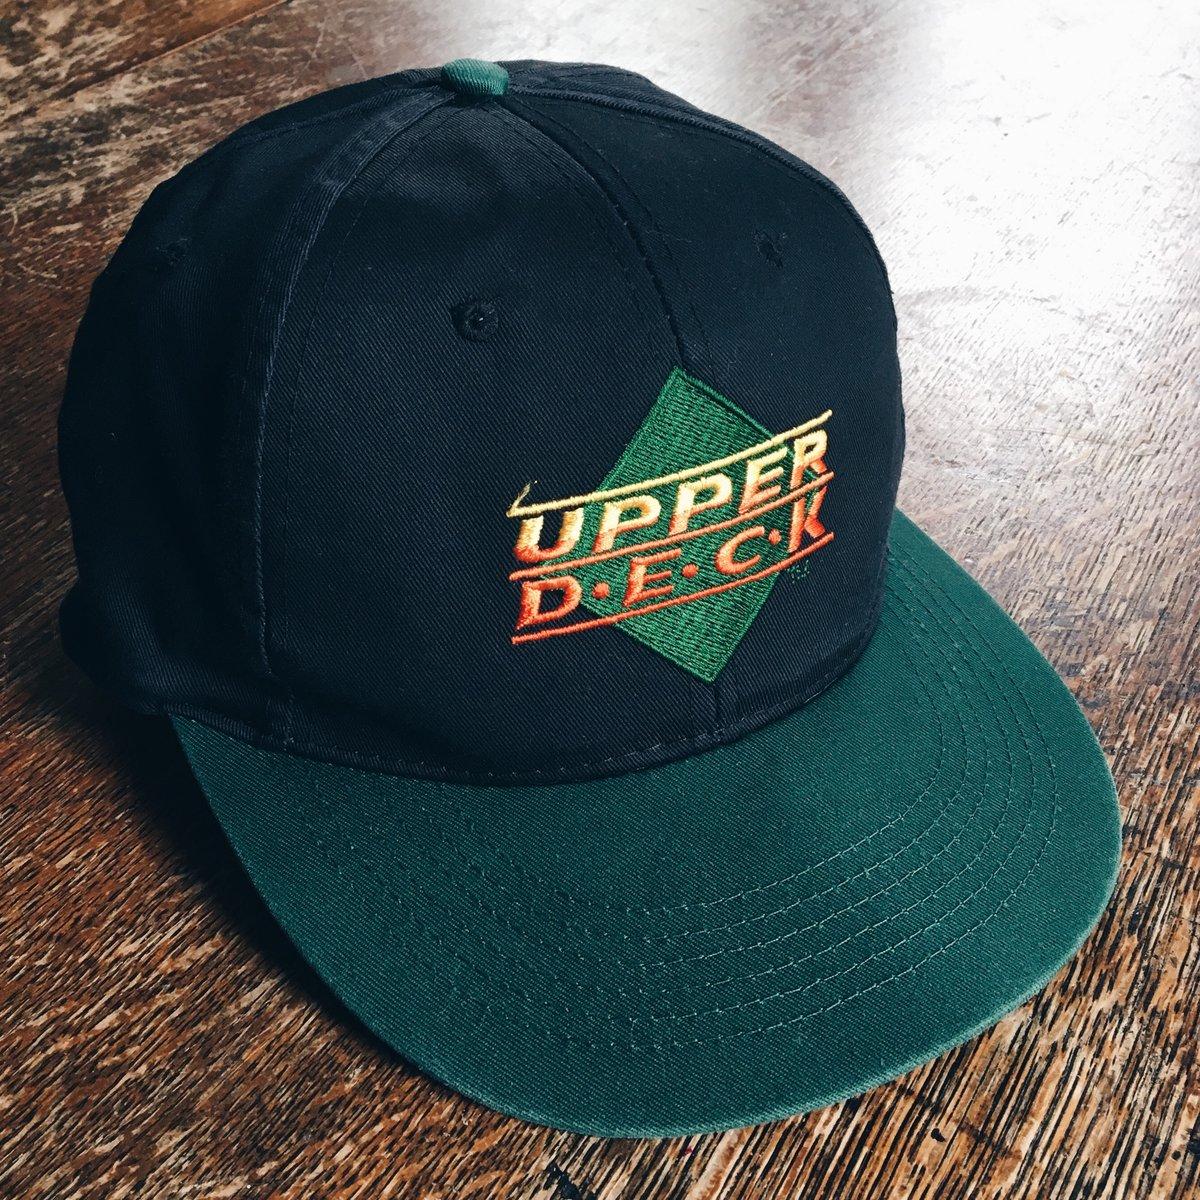 Image of Original 90's Upper Deck Snapback Hat.